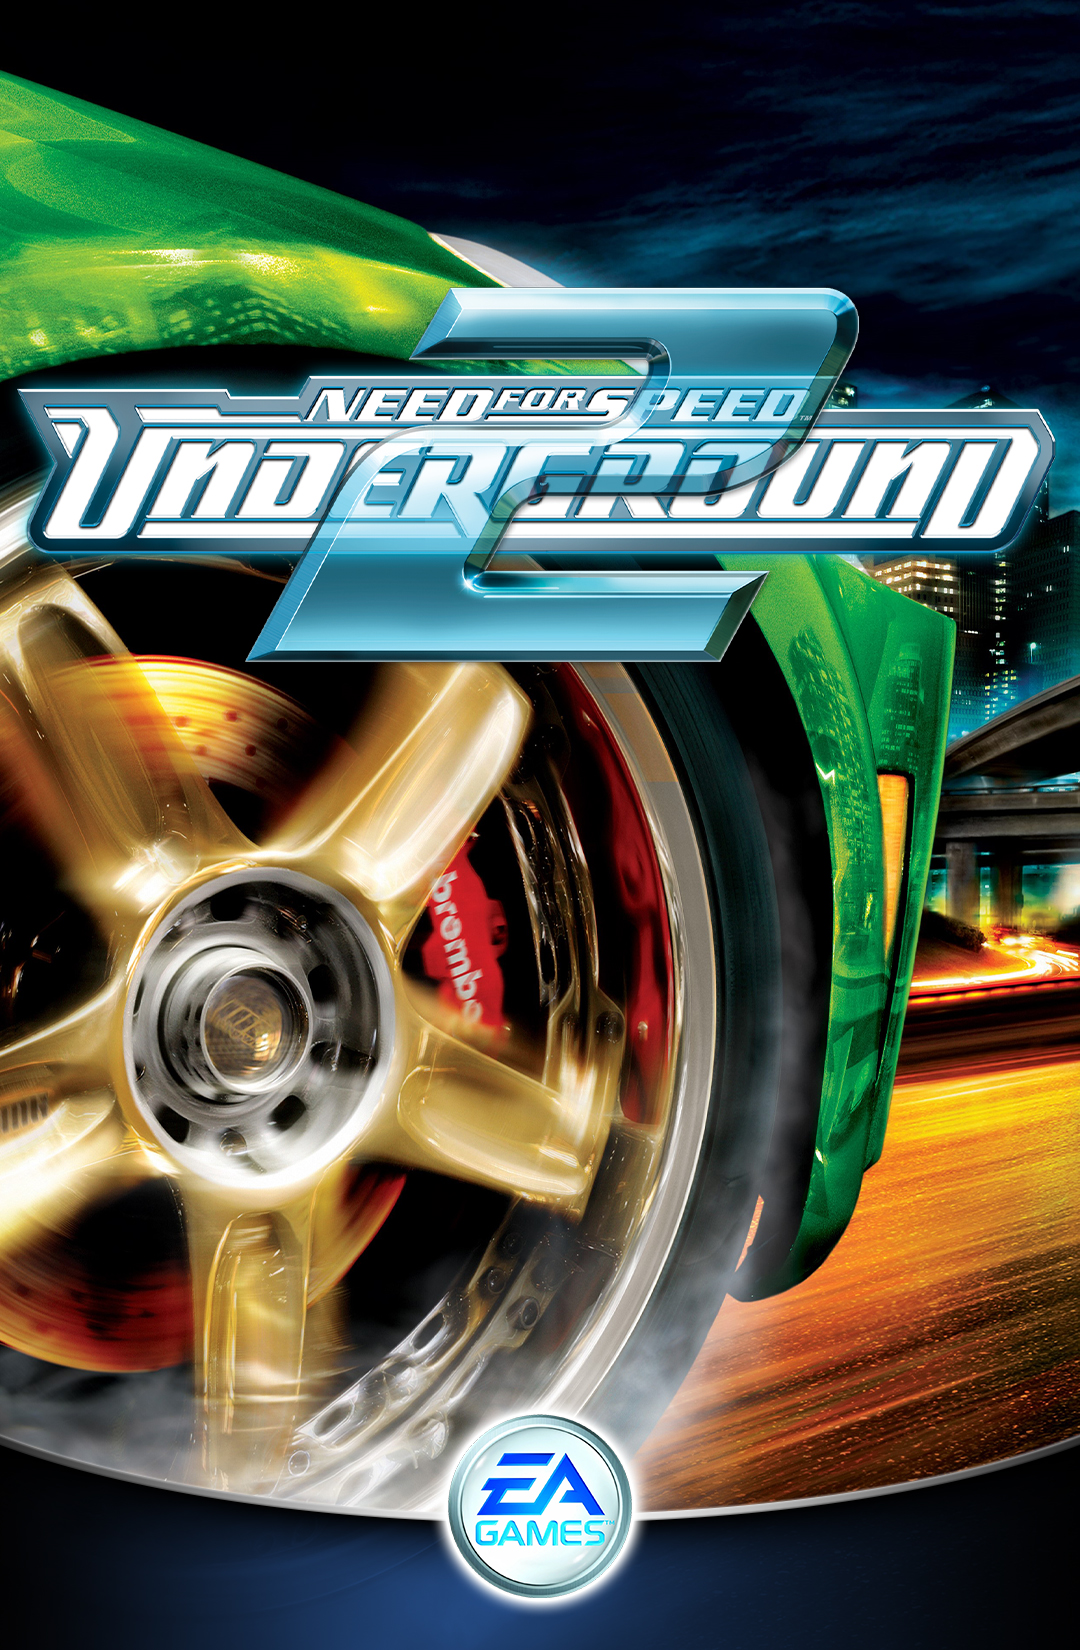 Need for speed underground 2 flash game casino strategies